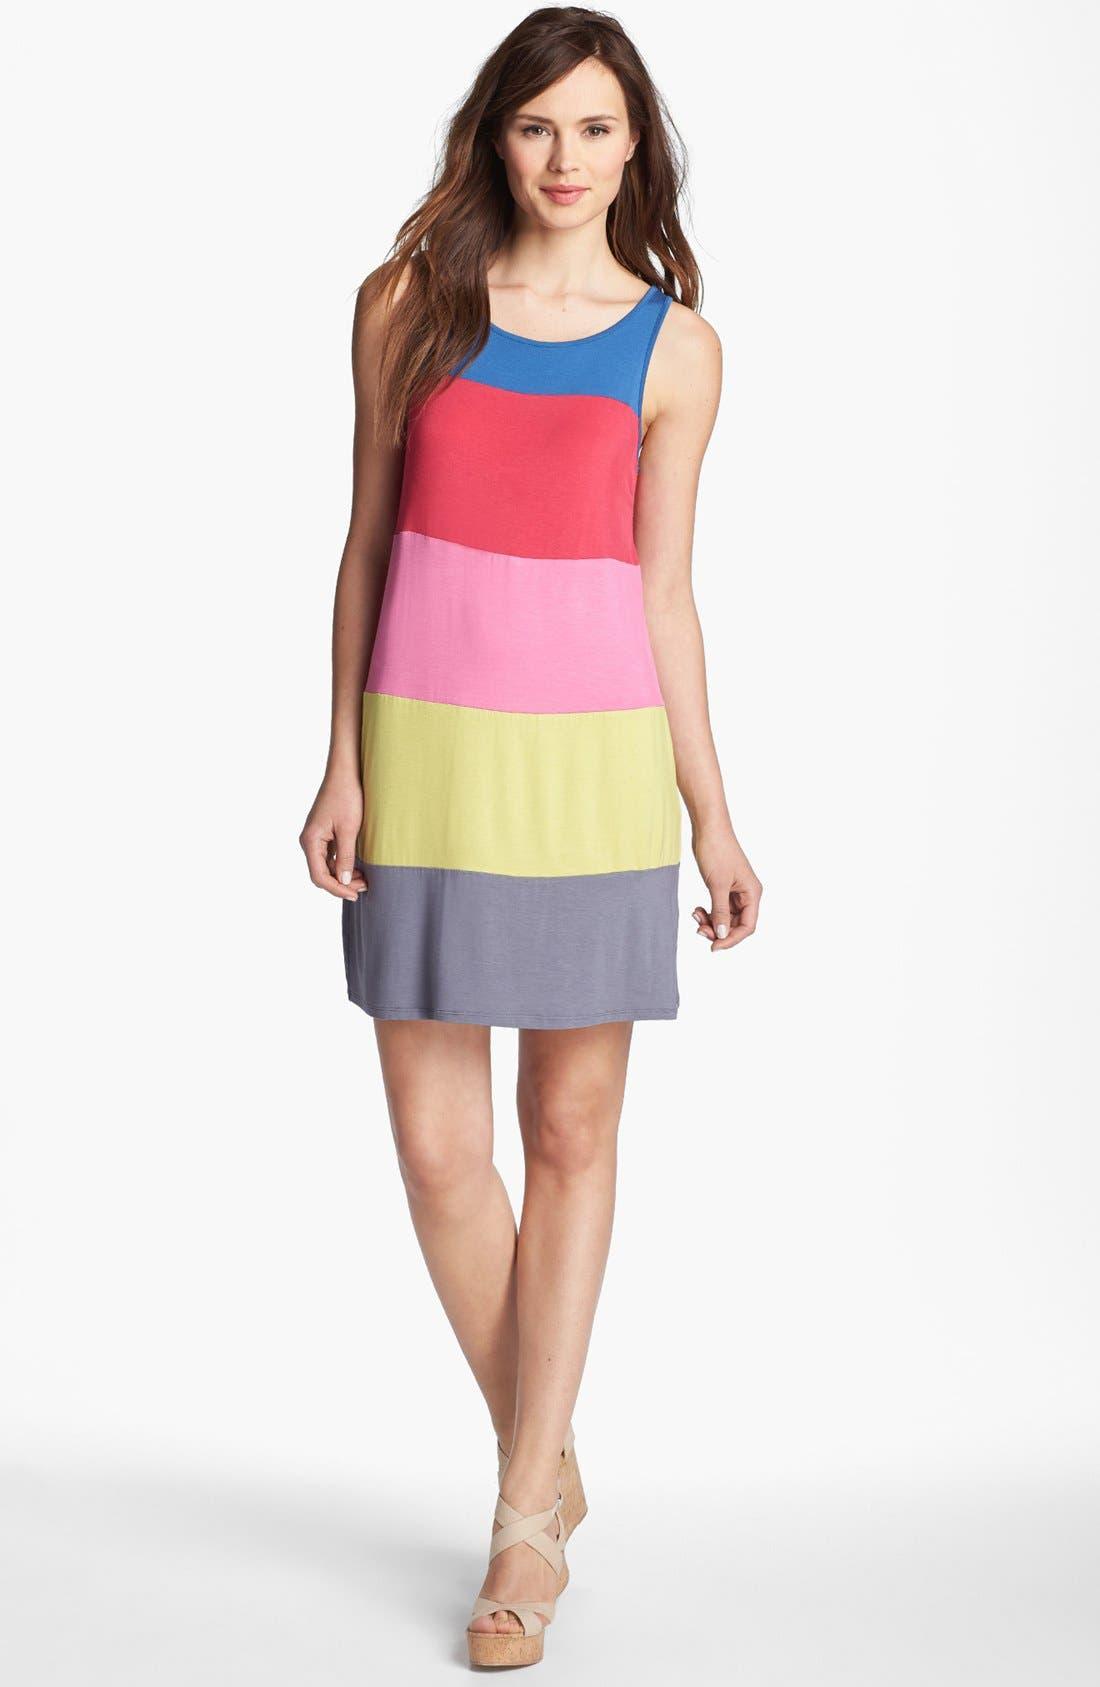 Alternate Image 1 Selected - Kensie Colorblock Knit Tank Dress